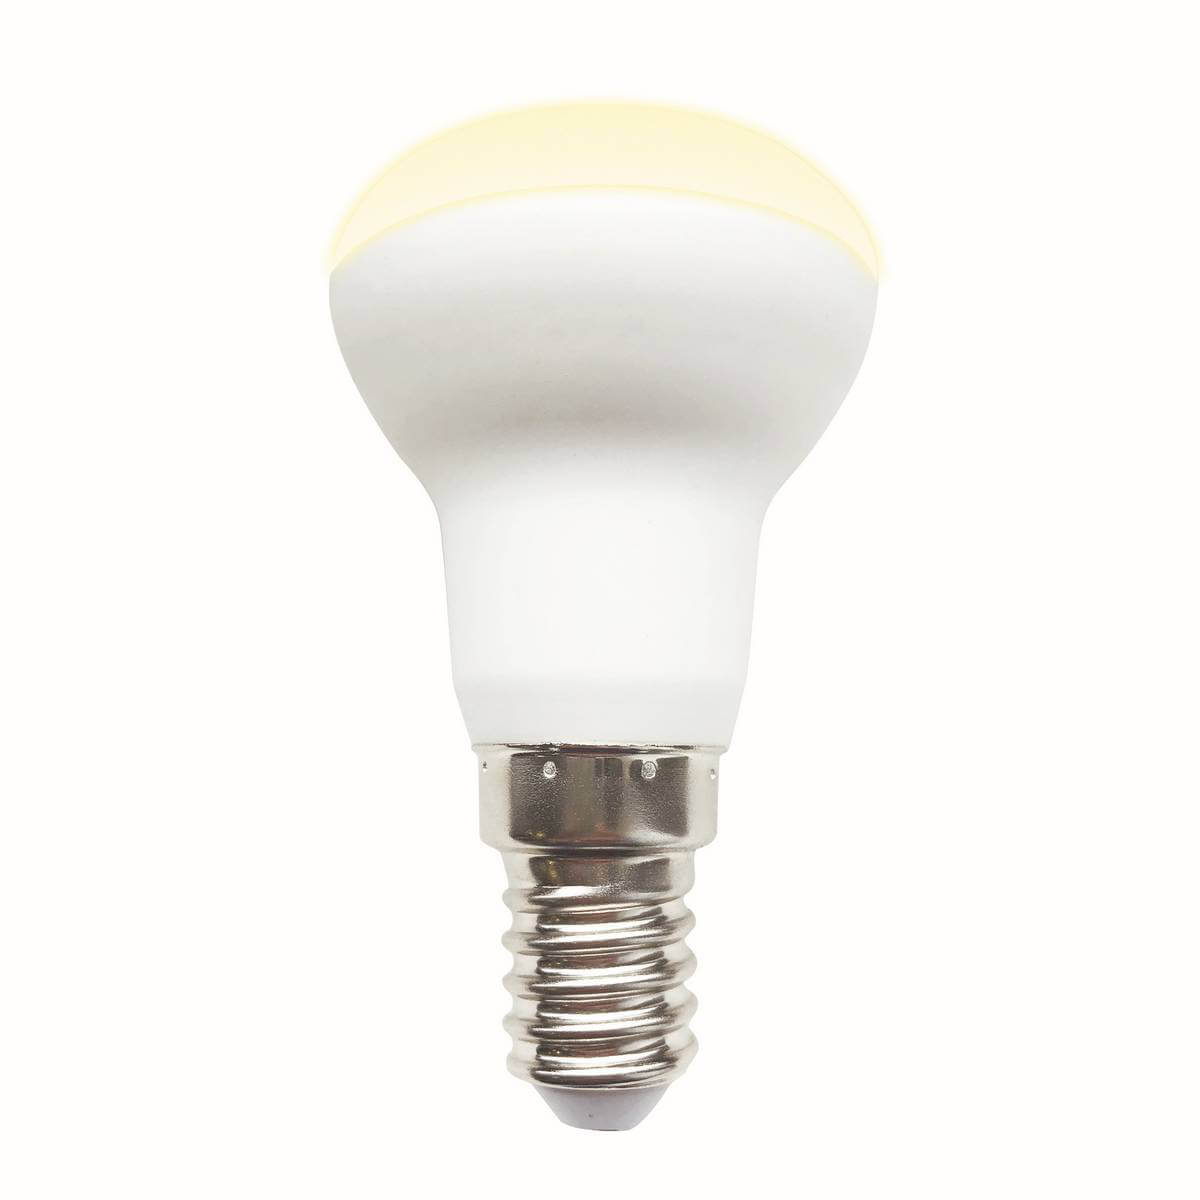 цена Лампочка Volpe LED-R39-3W/3000K/E14/FR/NR Norma онлайн в 2017 году